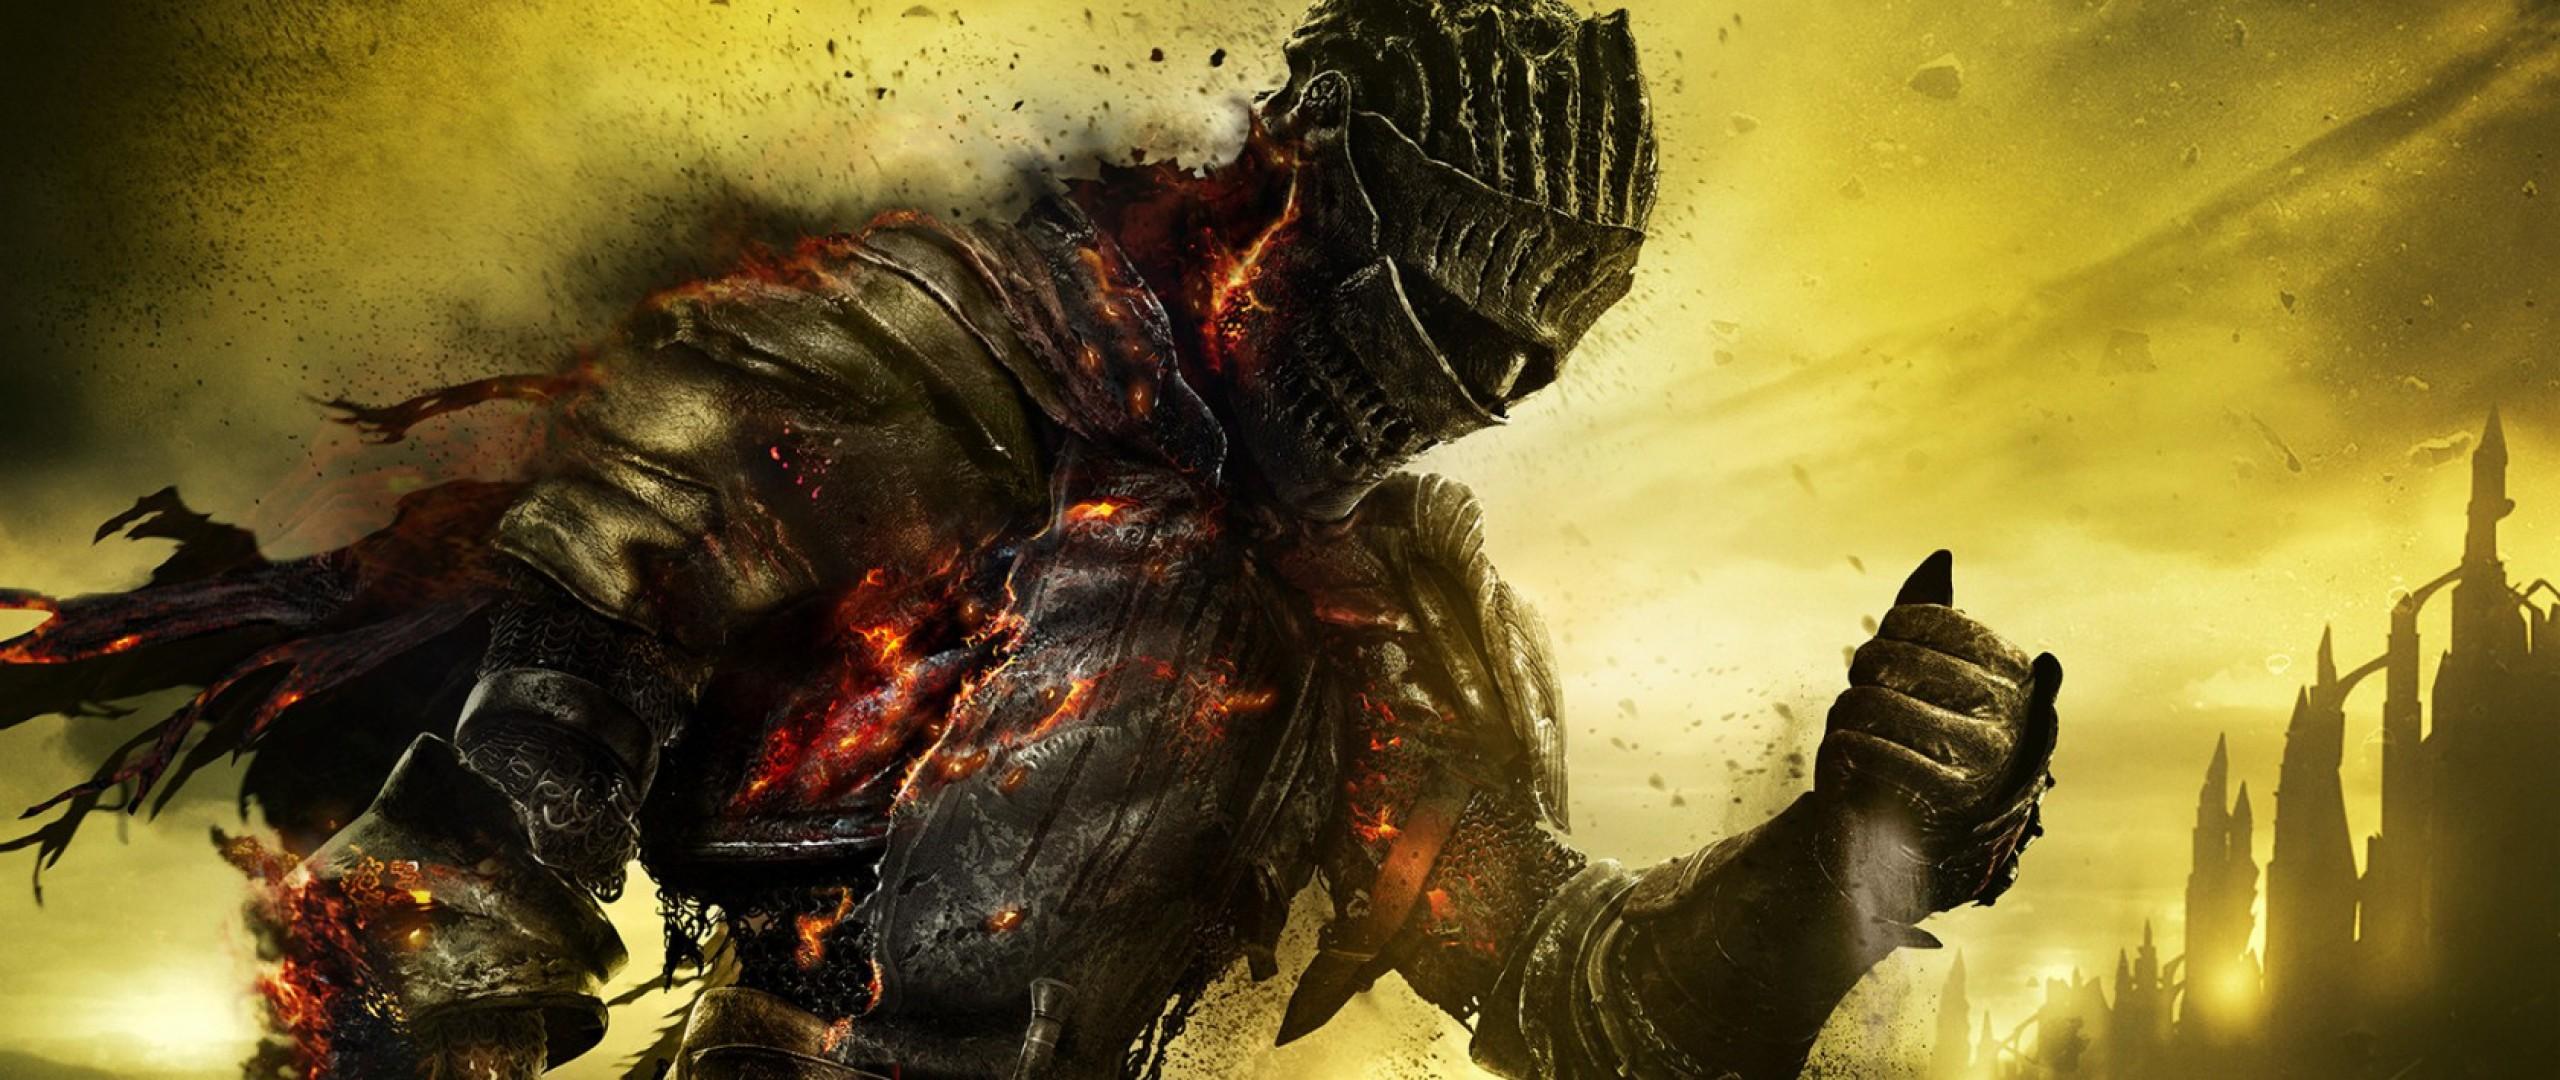 Dark-Souls-3-iii-Dark-Souls-3-Armor-